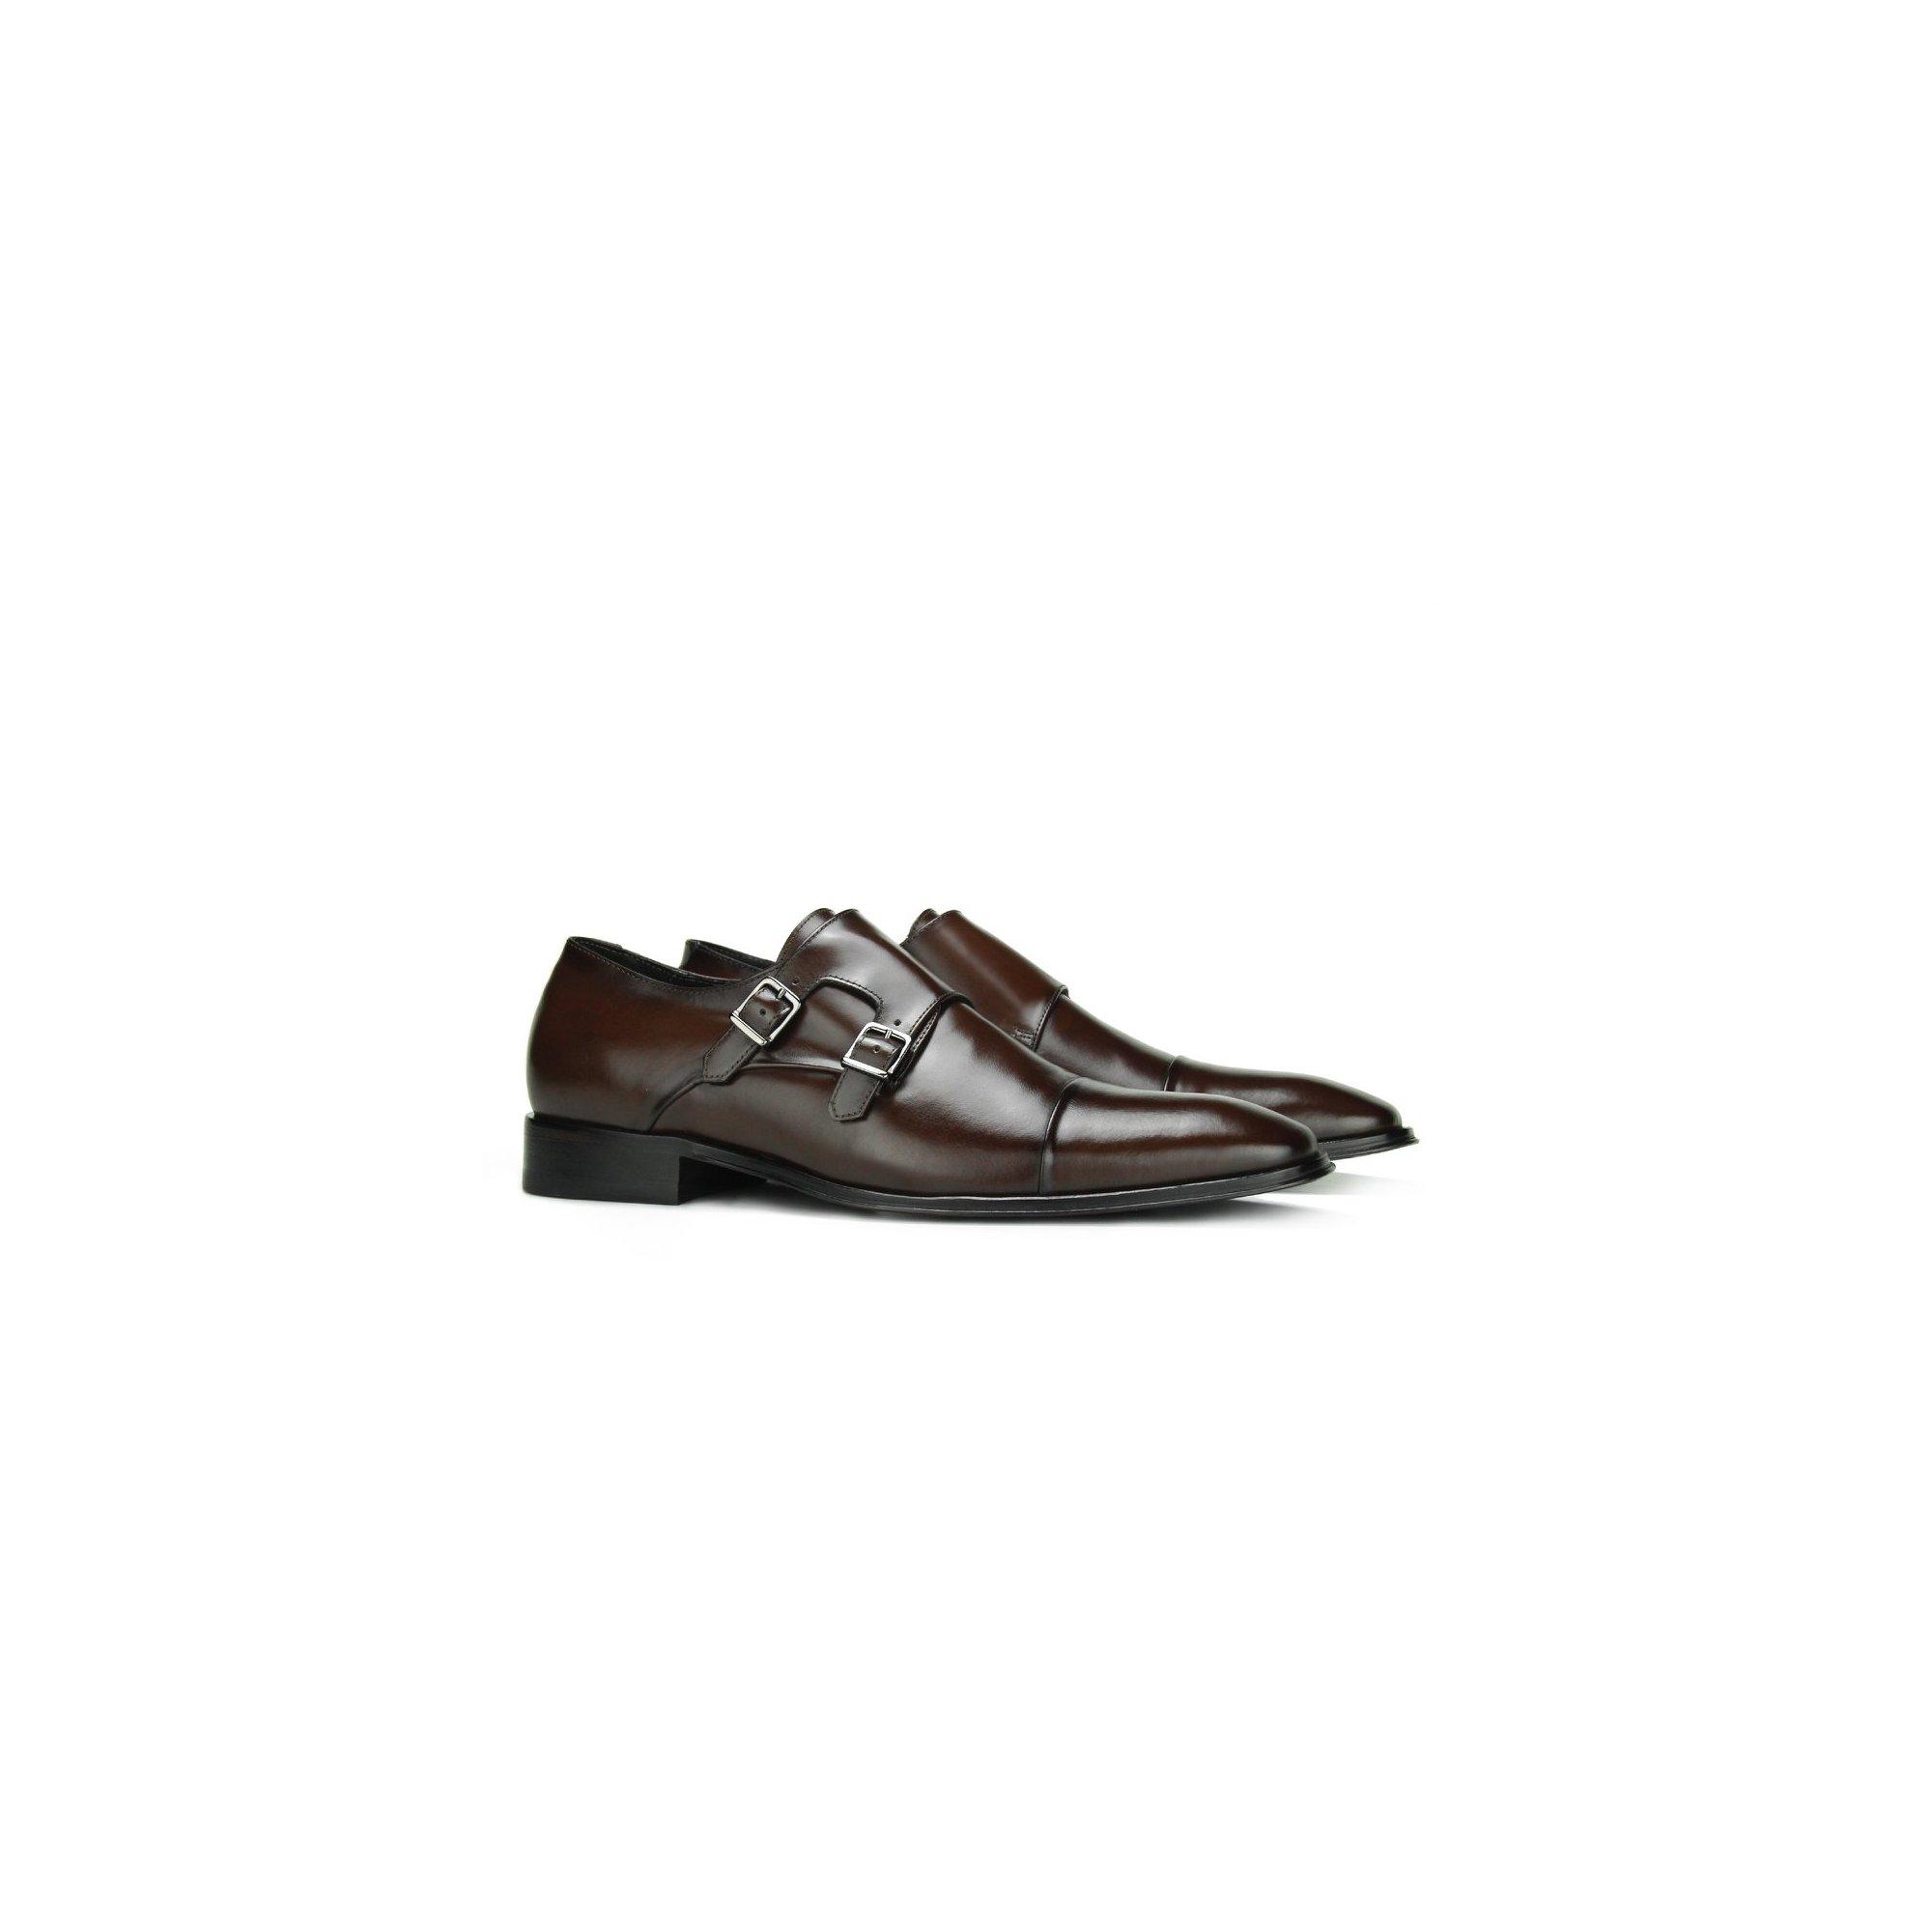 Sapato Social Masculino Monk Strap Marrom Couro Legítimo Monbran Dressy 0319039C